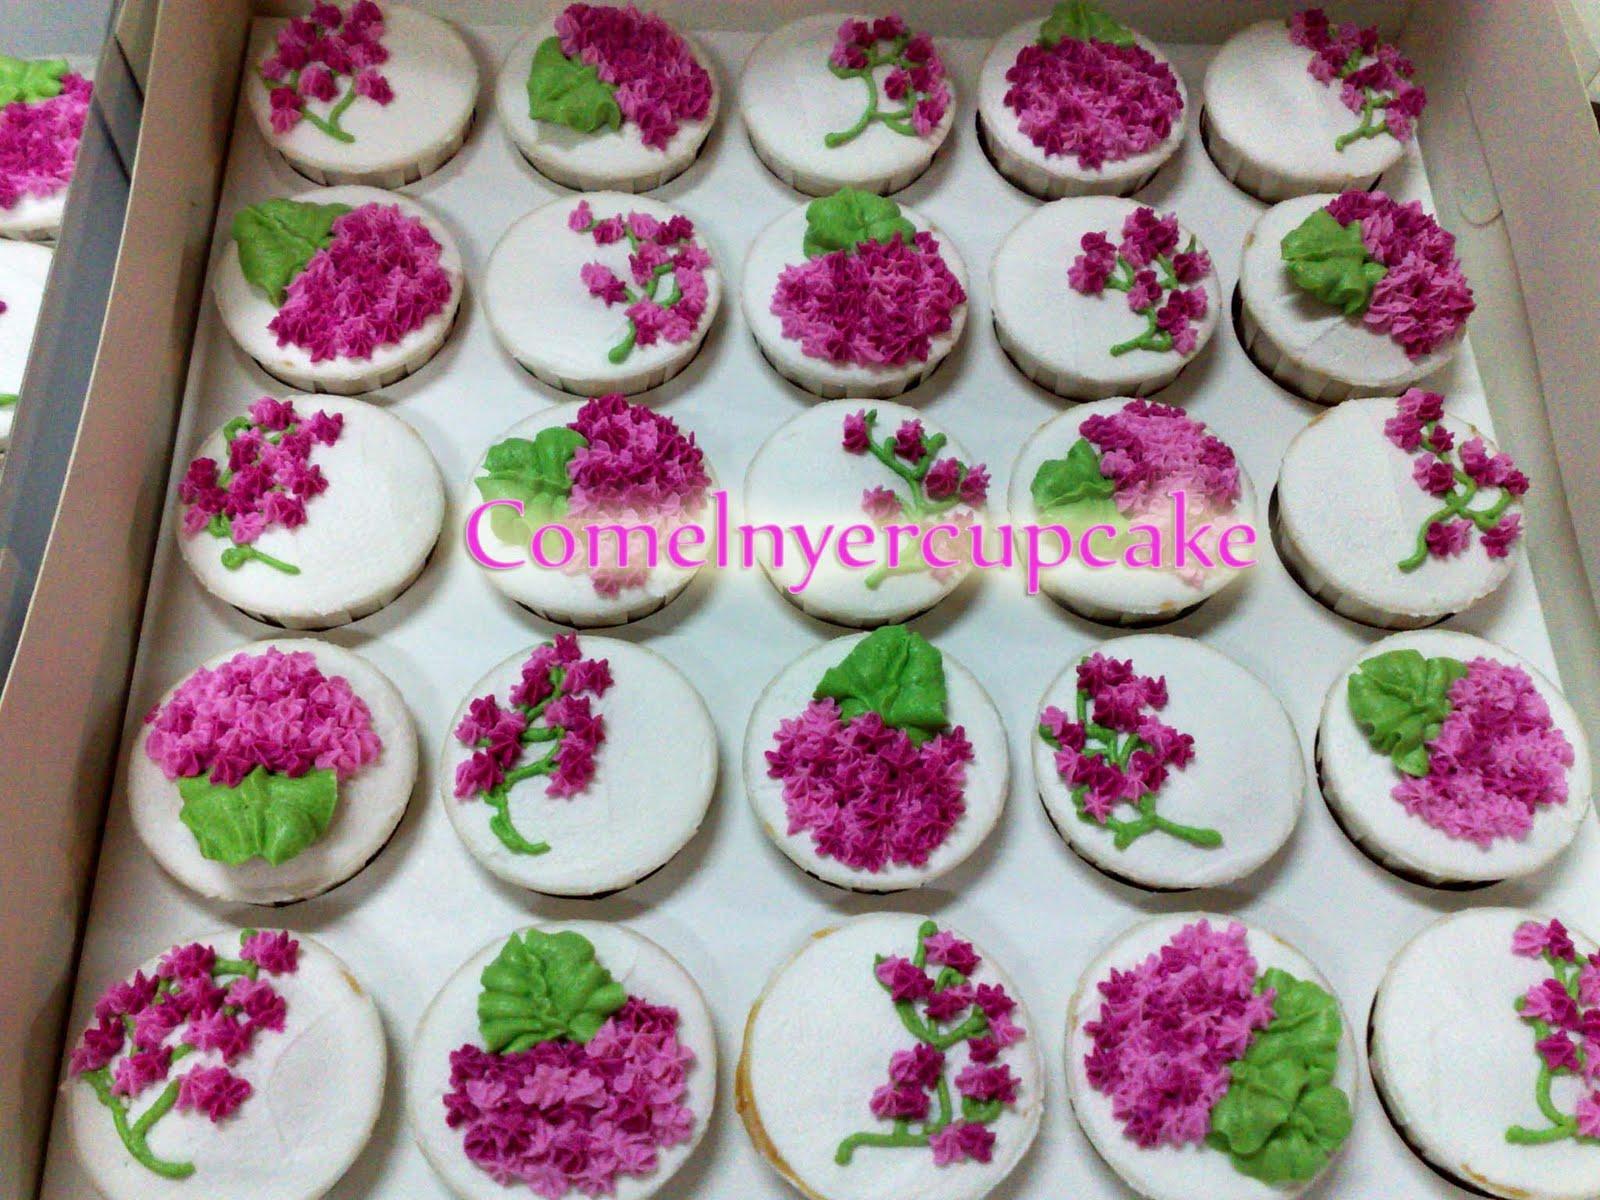 comelnyercupcake: Simple buttercream cupcakes